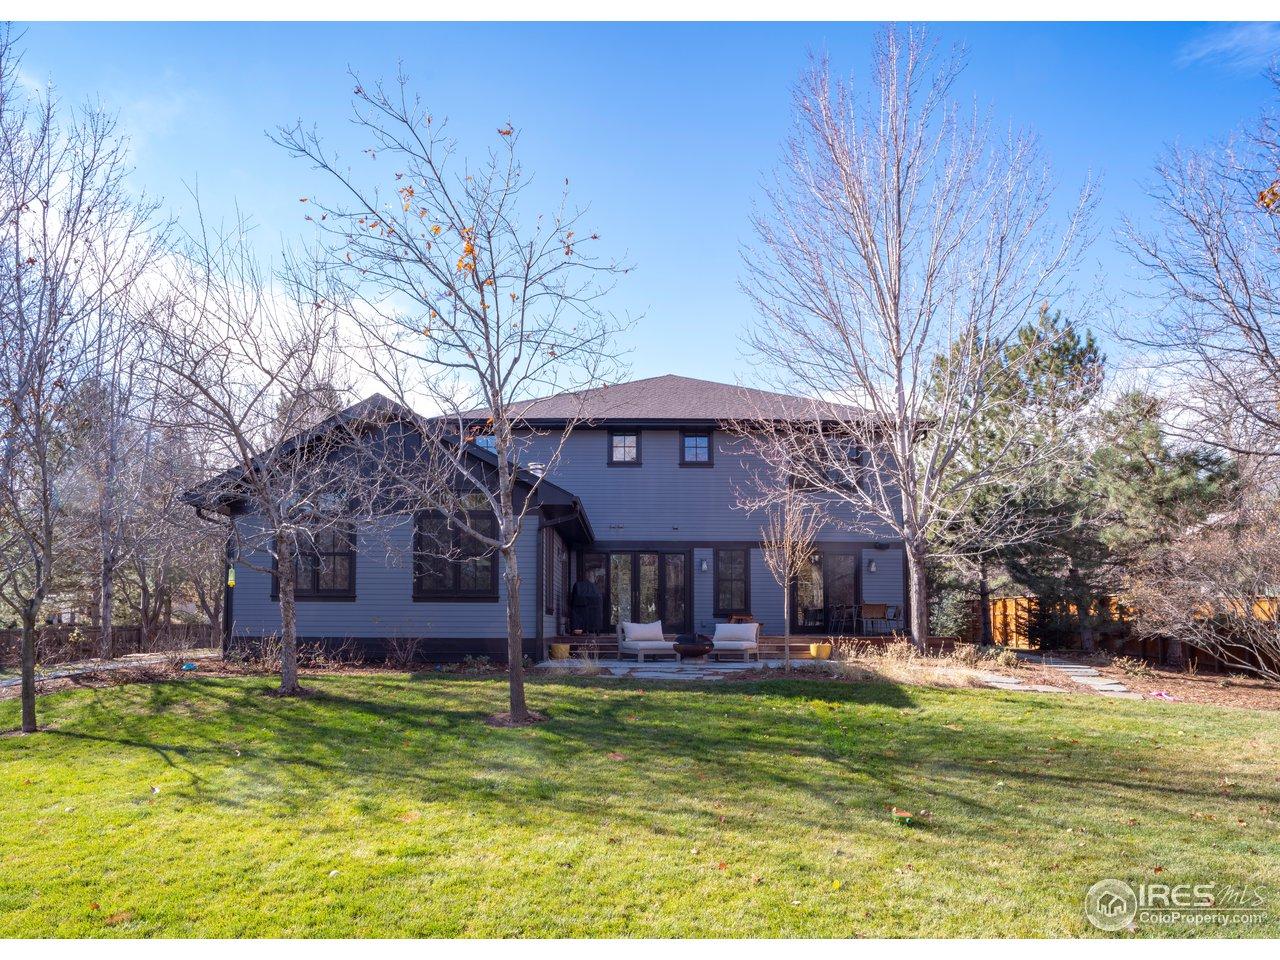 3660 19th St, Boulder CO 80304